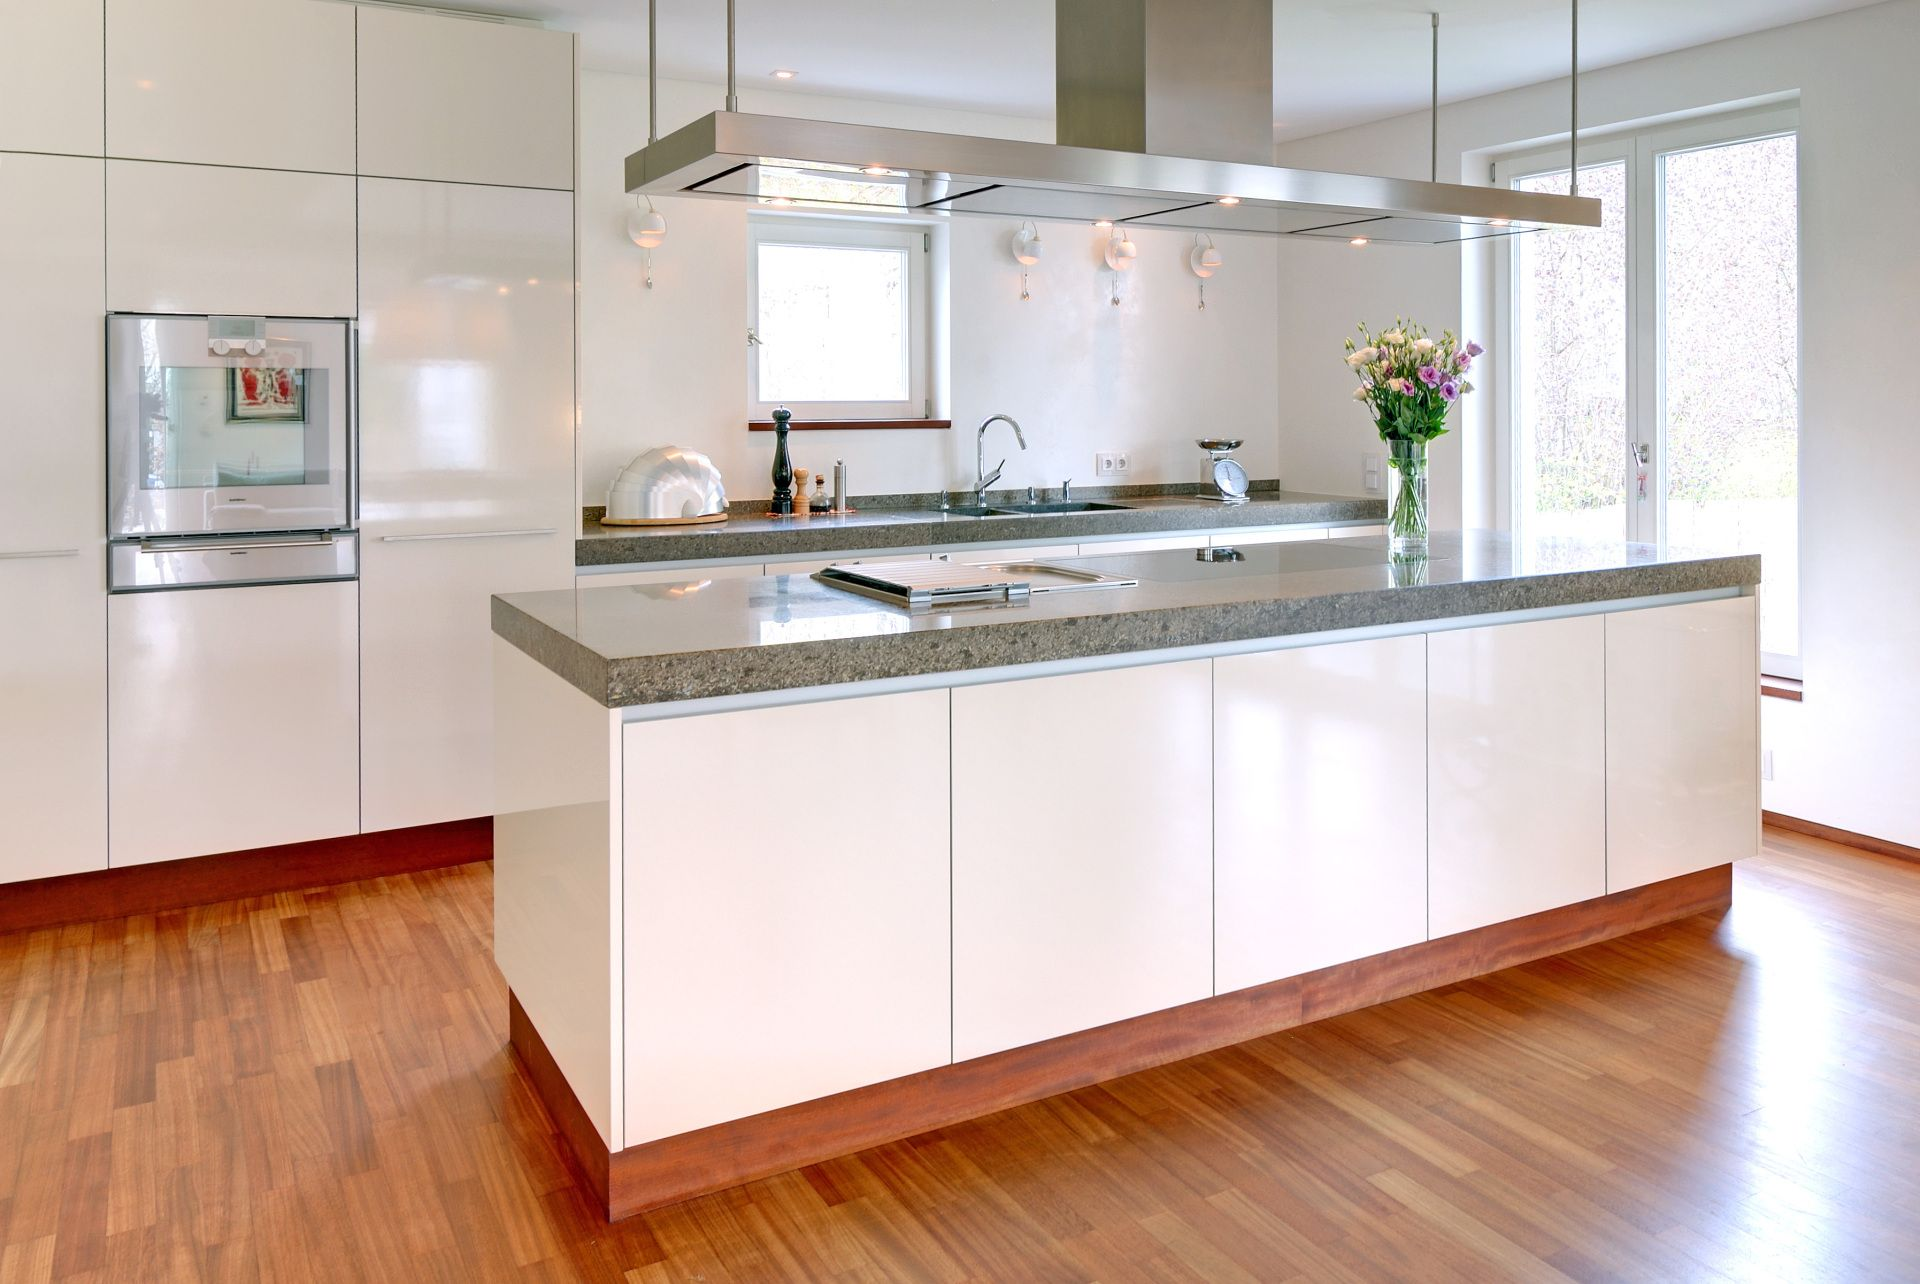 naturstein arbeitsplatte in modern rustikaler k che. Black Bedroom Furniture Sets. Home Design Ideas